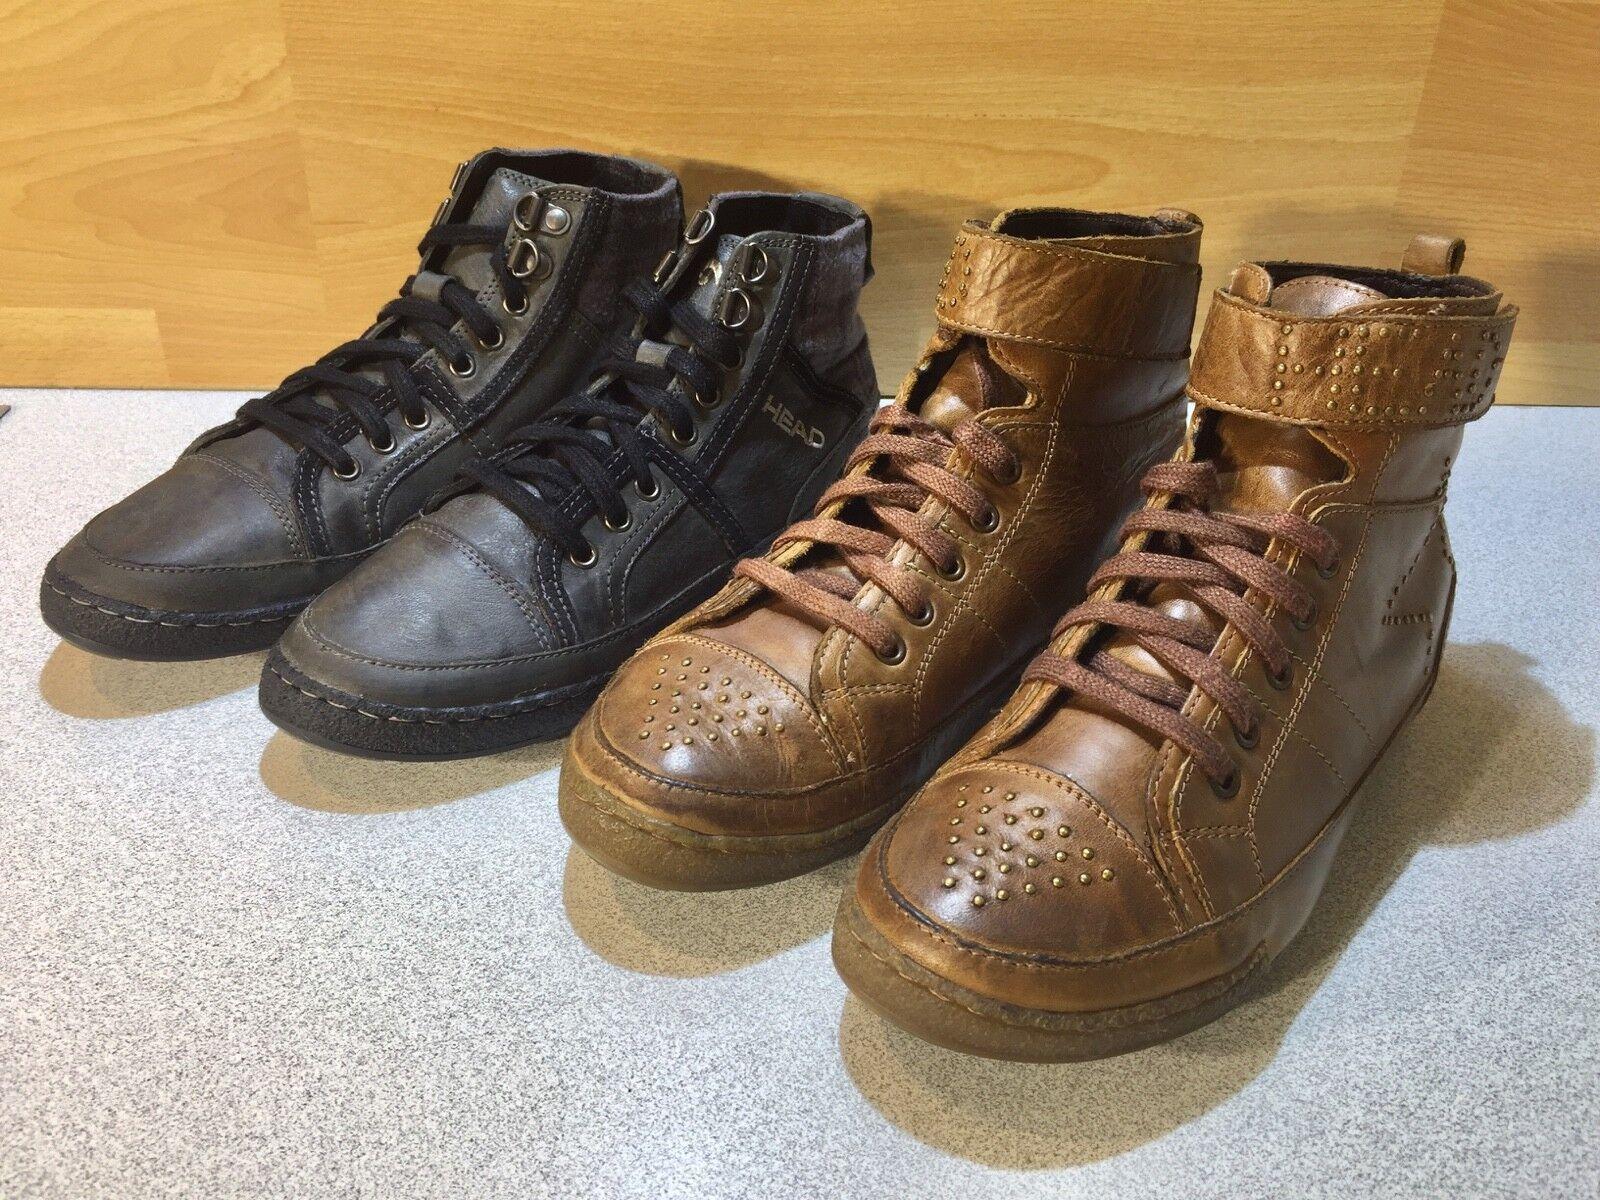 2x Head Sneakers, Nappaleder, cognac + grau, grau, grau, Gr: 37, Neu, #SCH-67 06be59